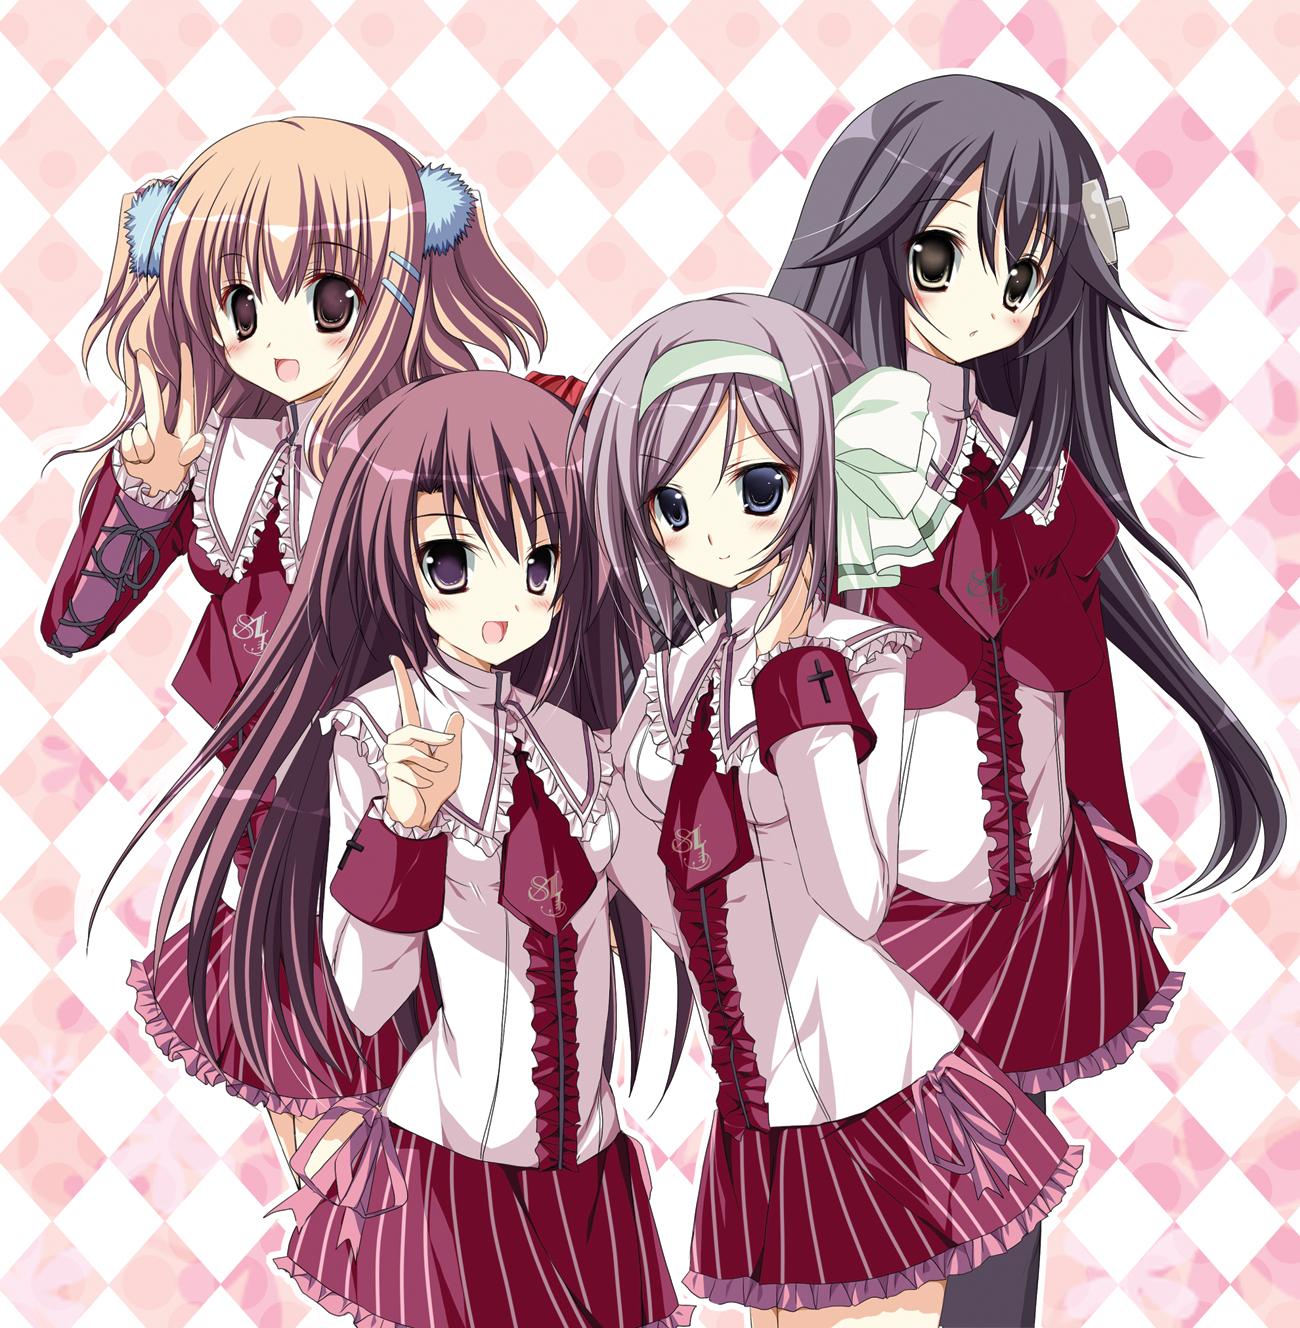 Mizusawa Mimori Image #914477 - Zerochan Anime Image Board